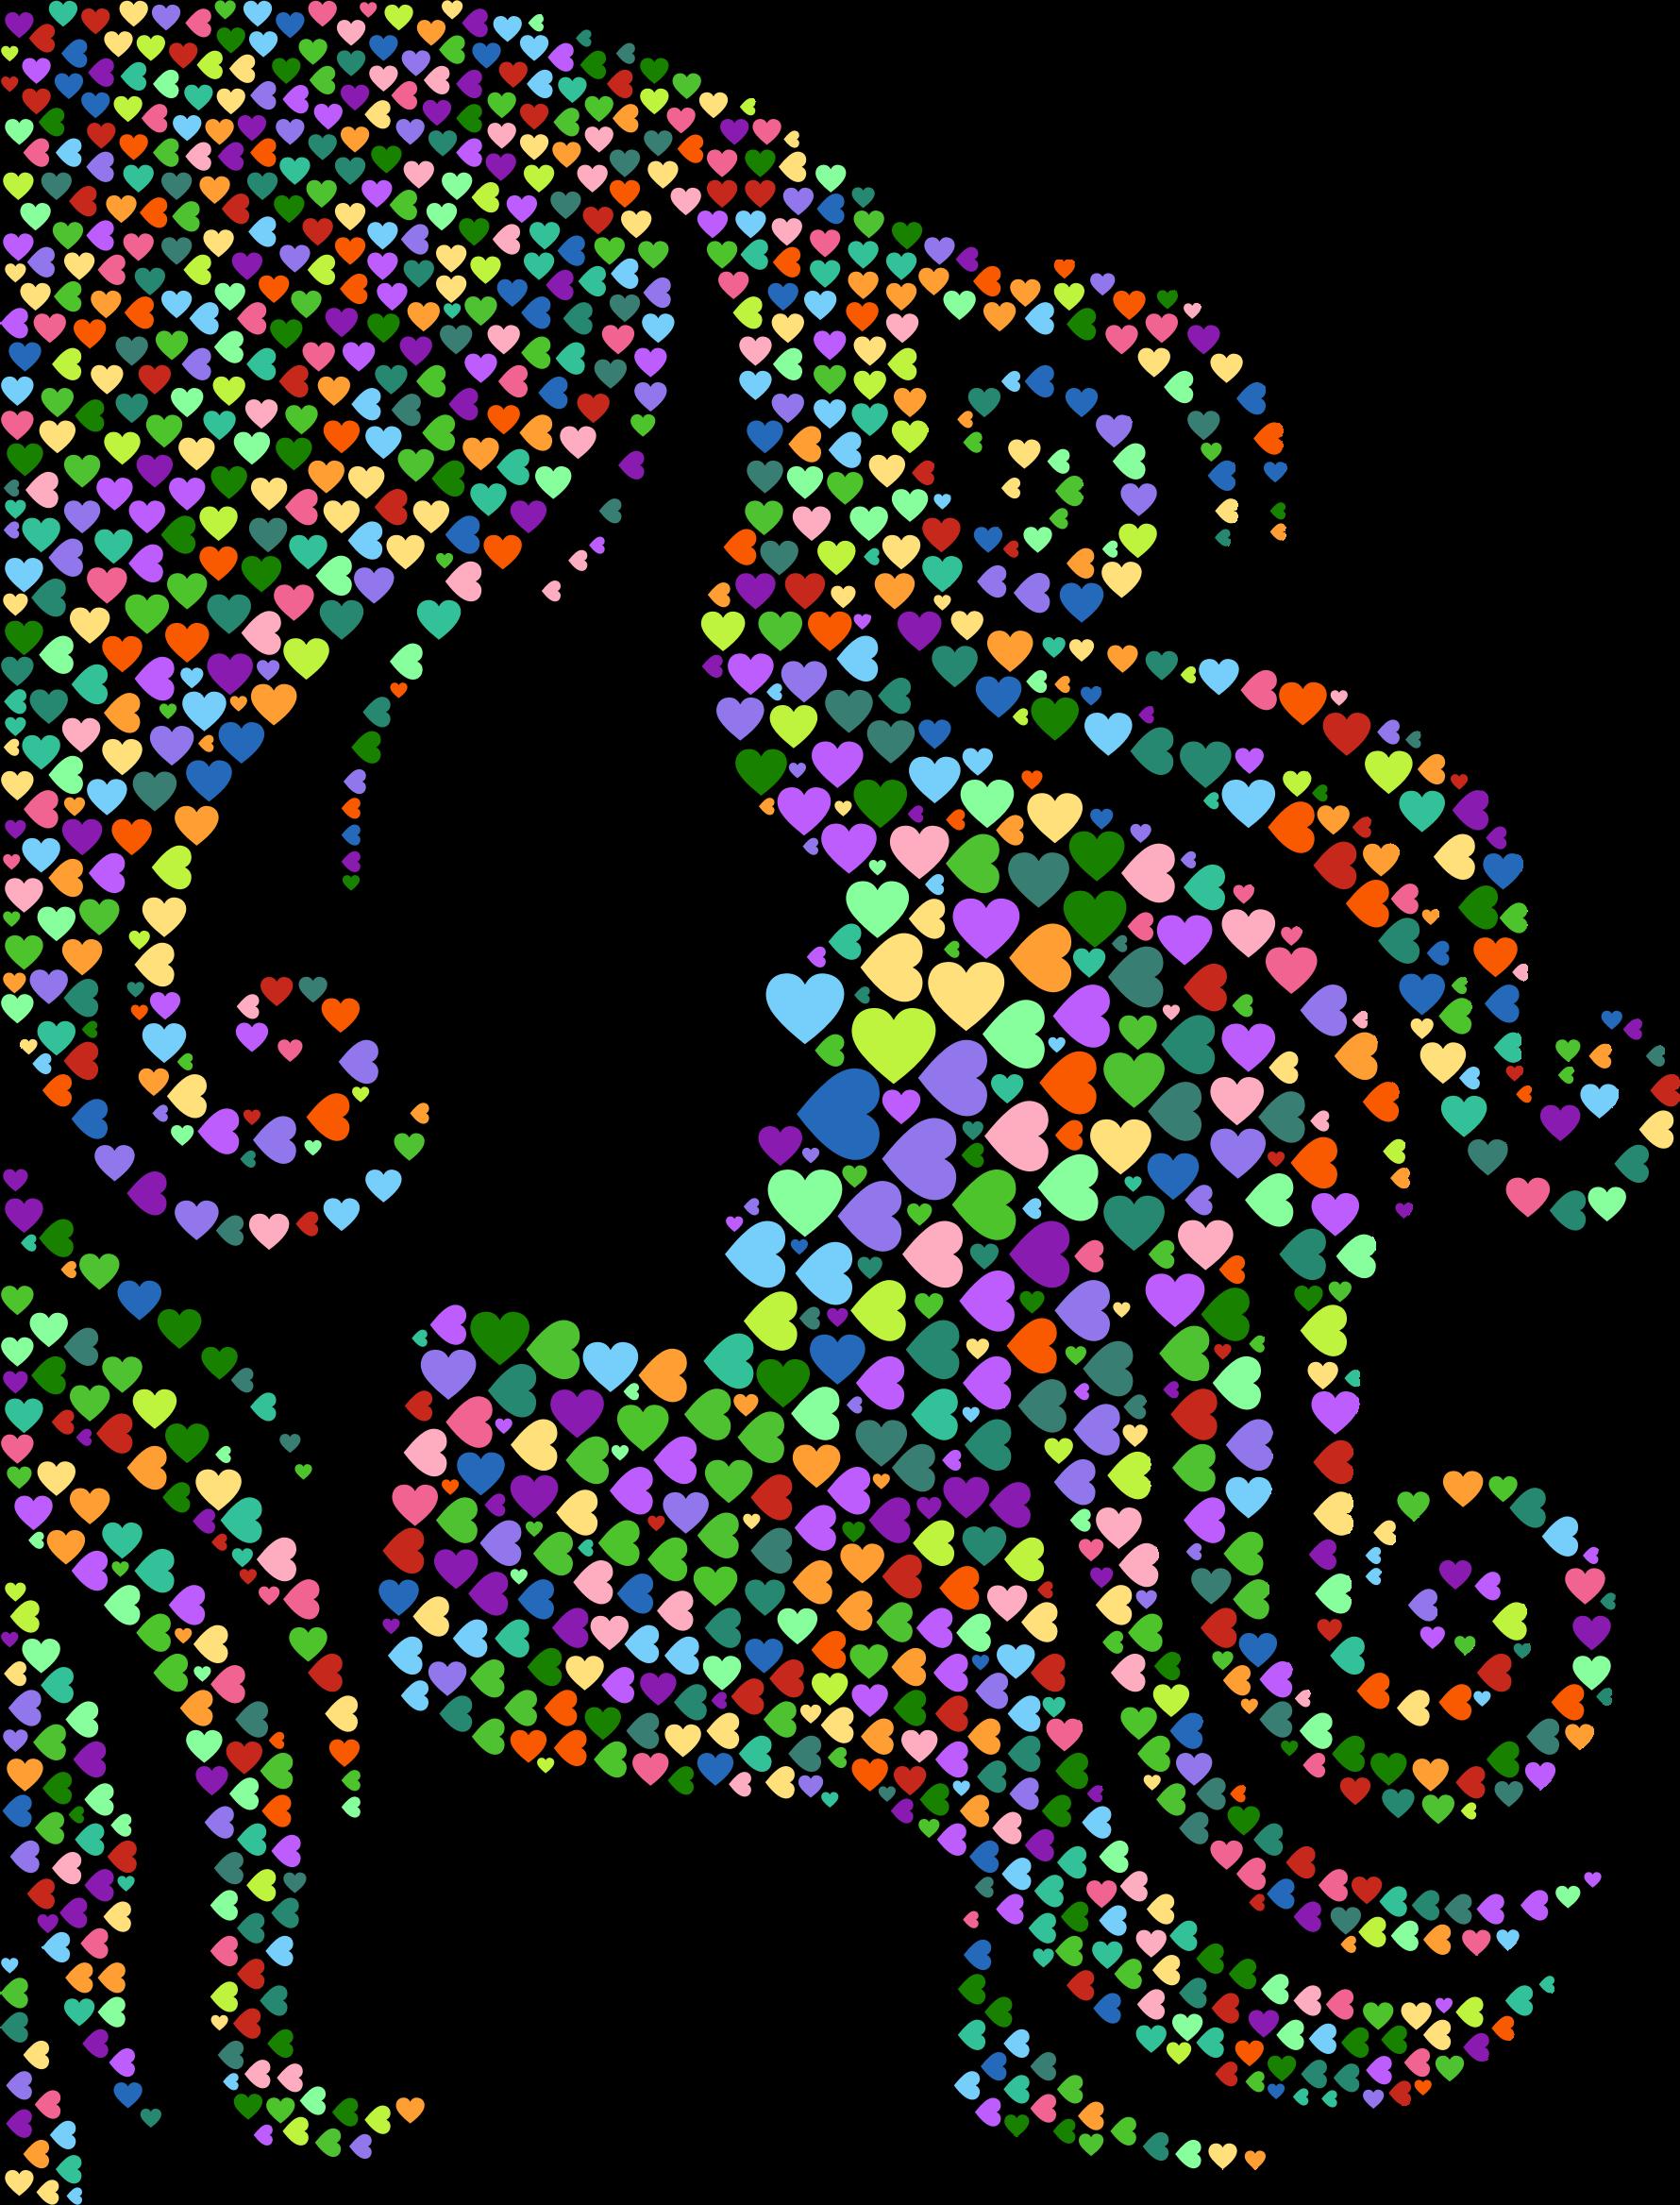 Female clipart graphic designer. Hair profile silhouette hearts